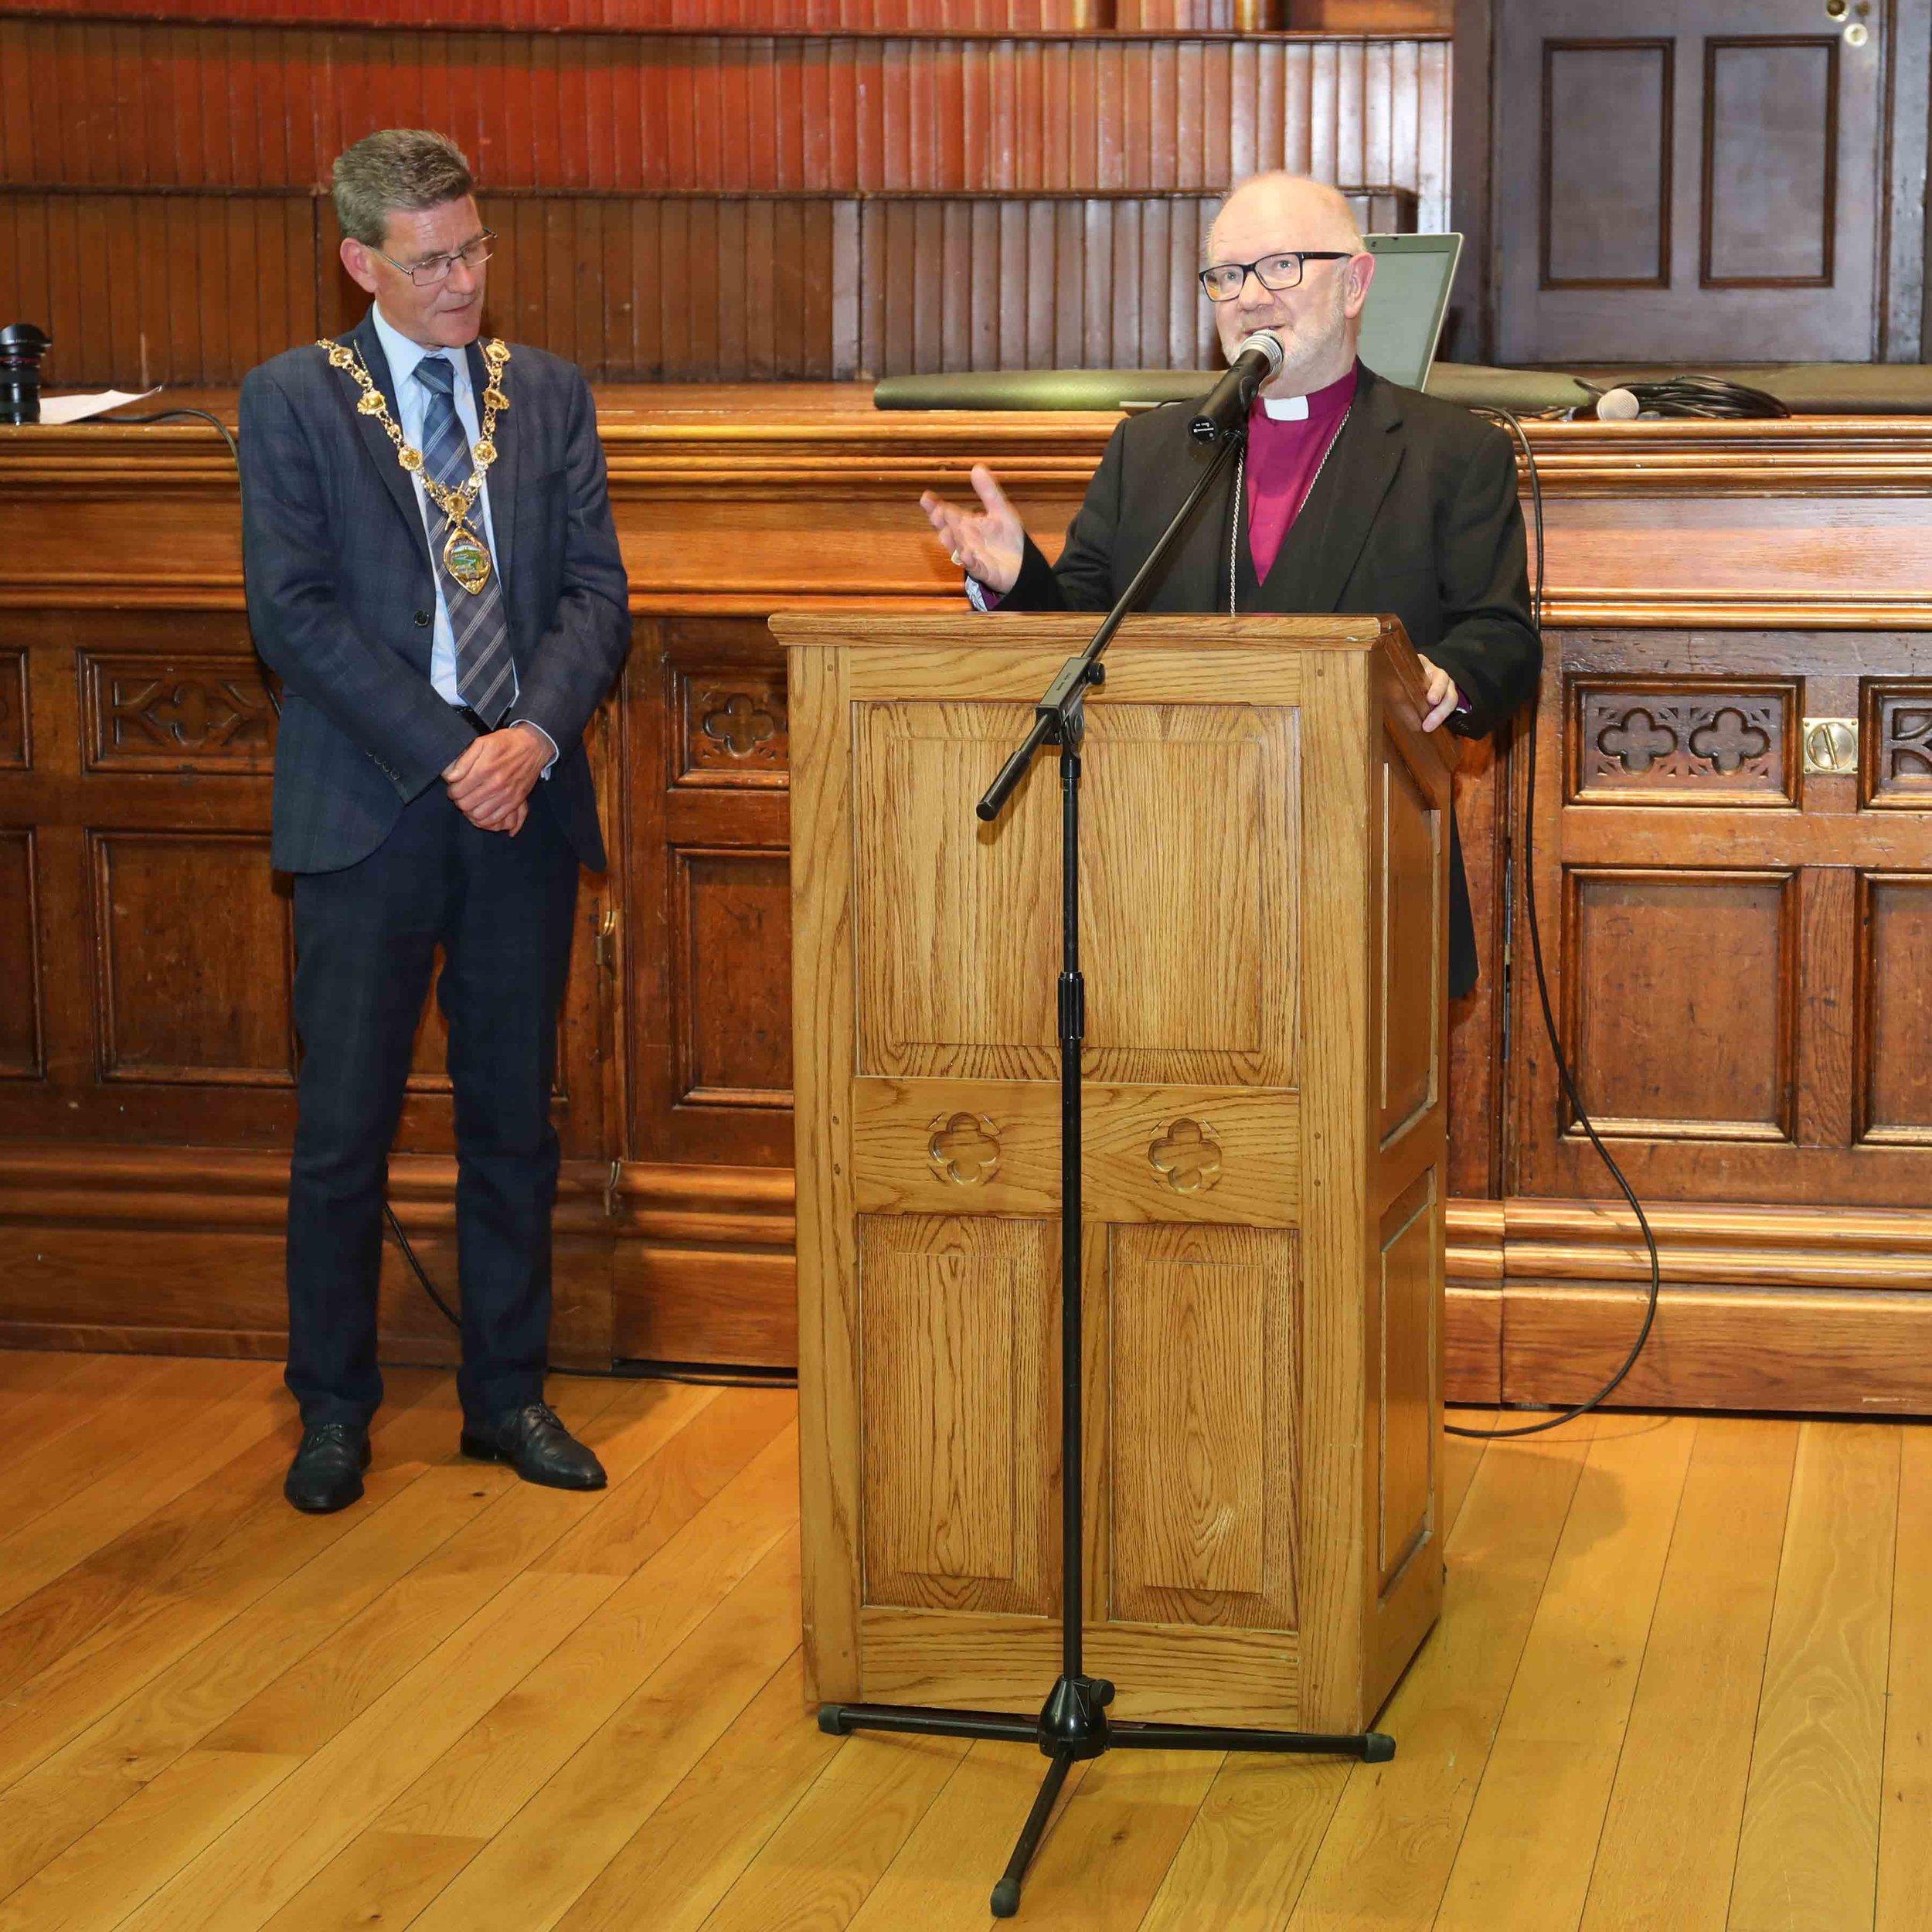 Archbishop Richard Clarke thanks the Mayor